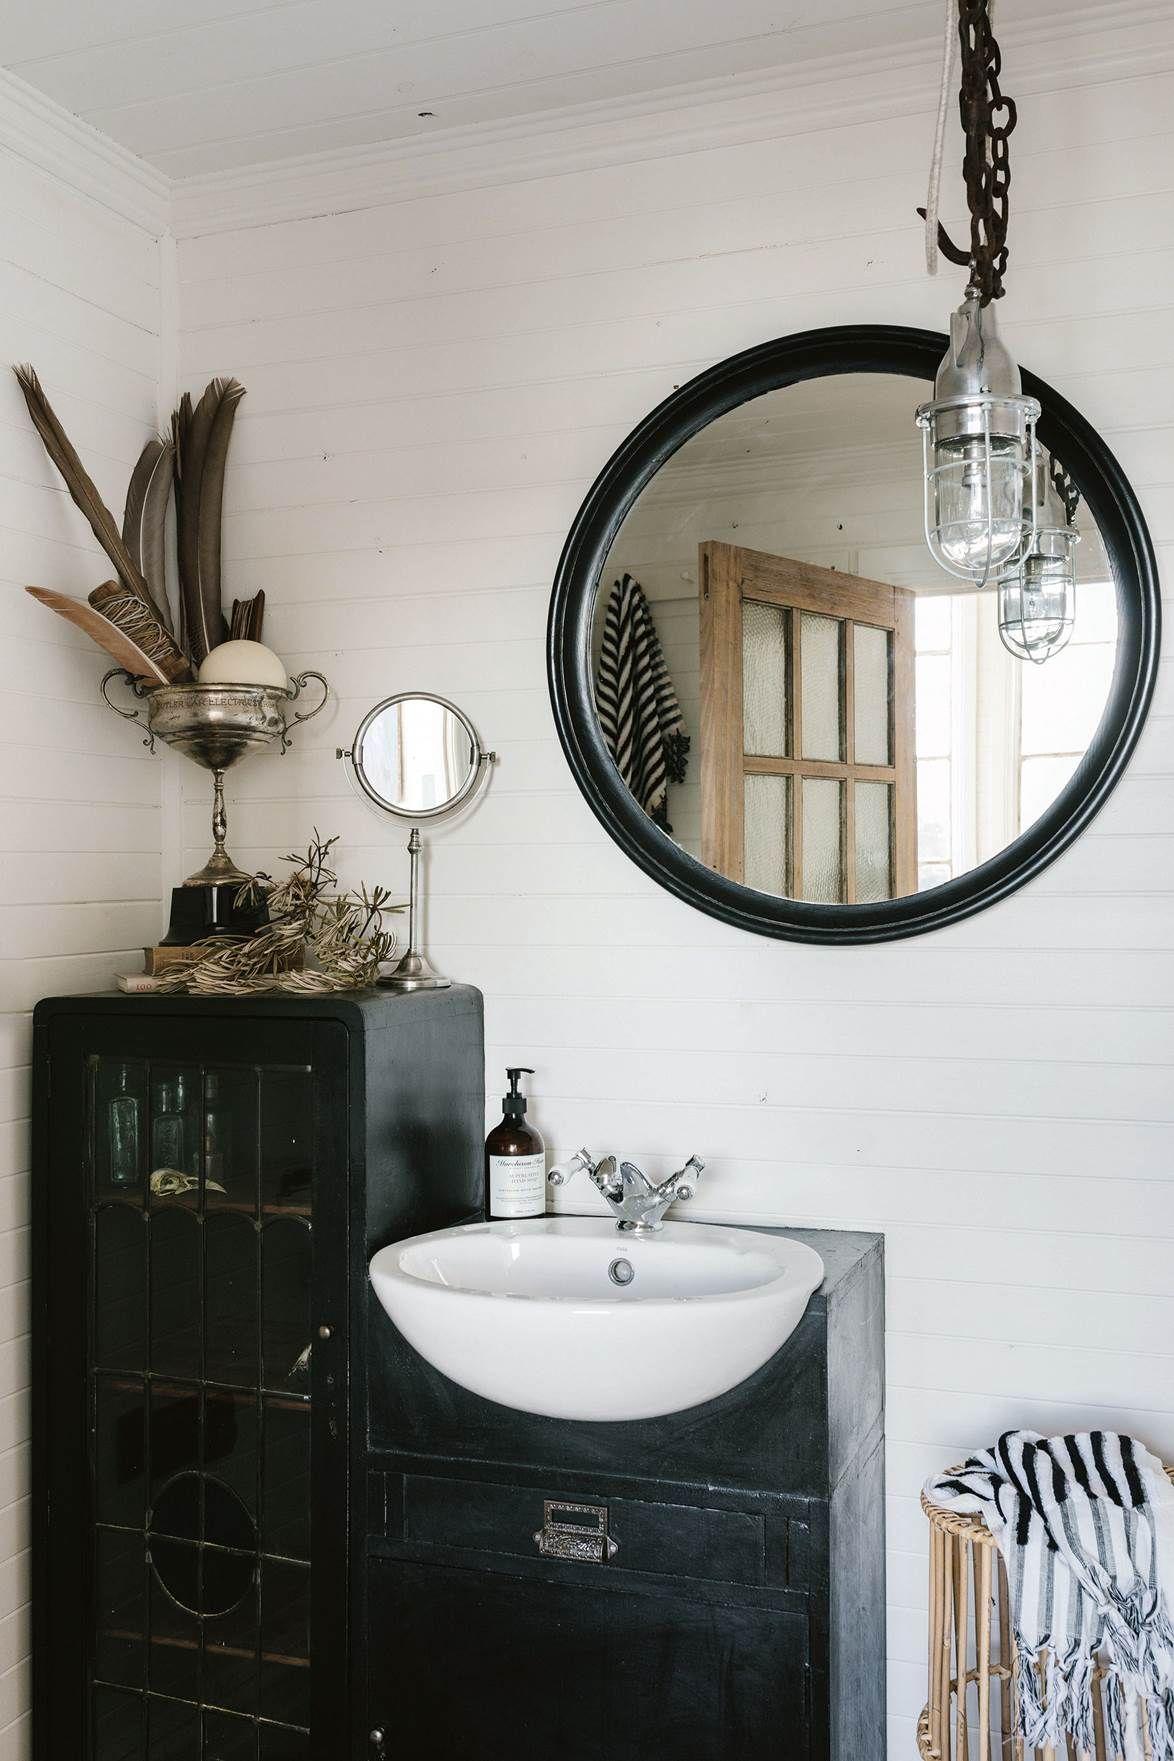 Inside Captain S Rest Tasmania S Cosiest Airbnb Cottage Bathroom Light Fixtures Bathroom Decor Round Mirror Bathroom